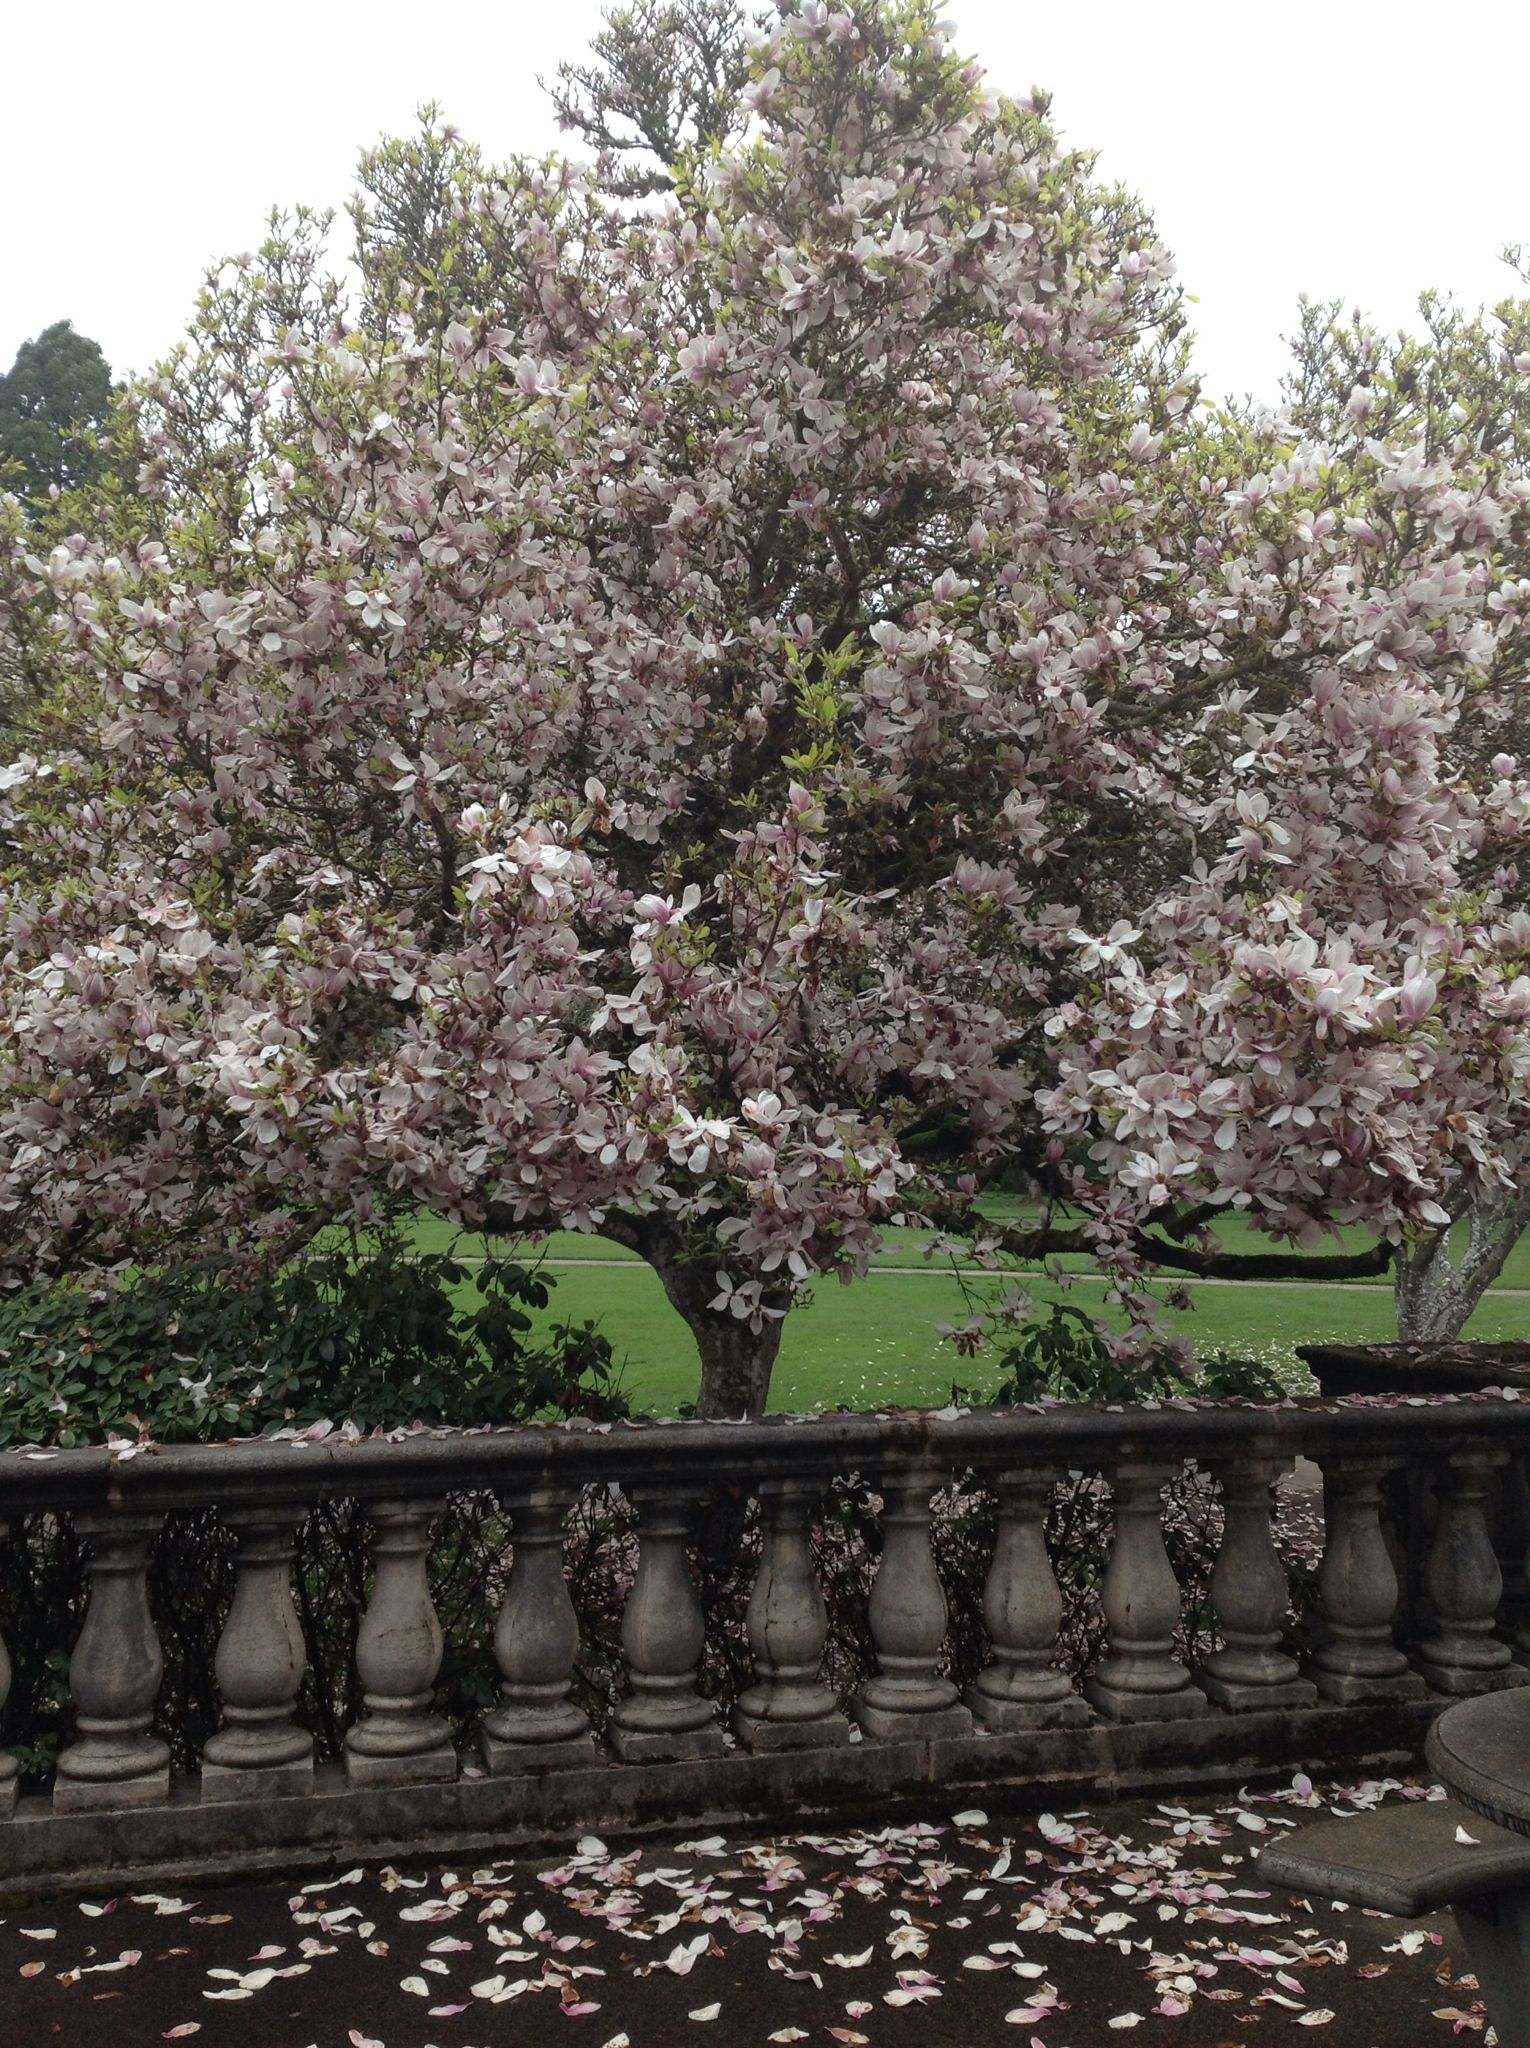 Oregon state tulip magnolia trees